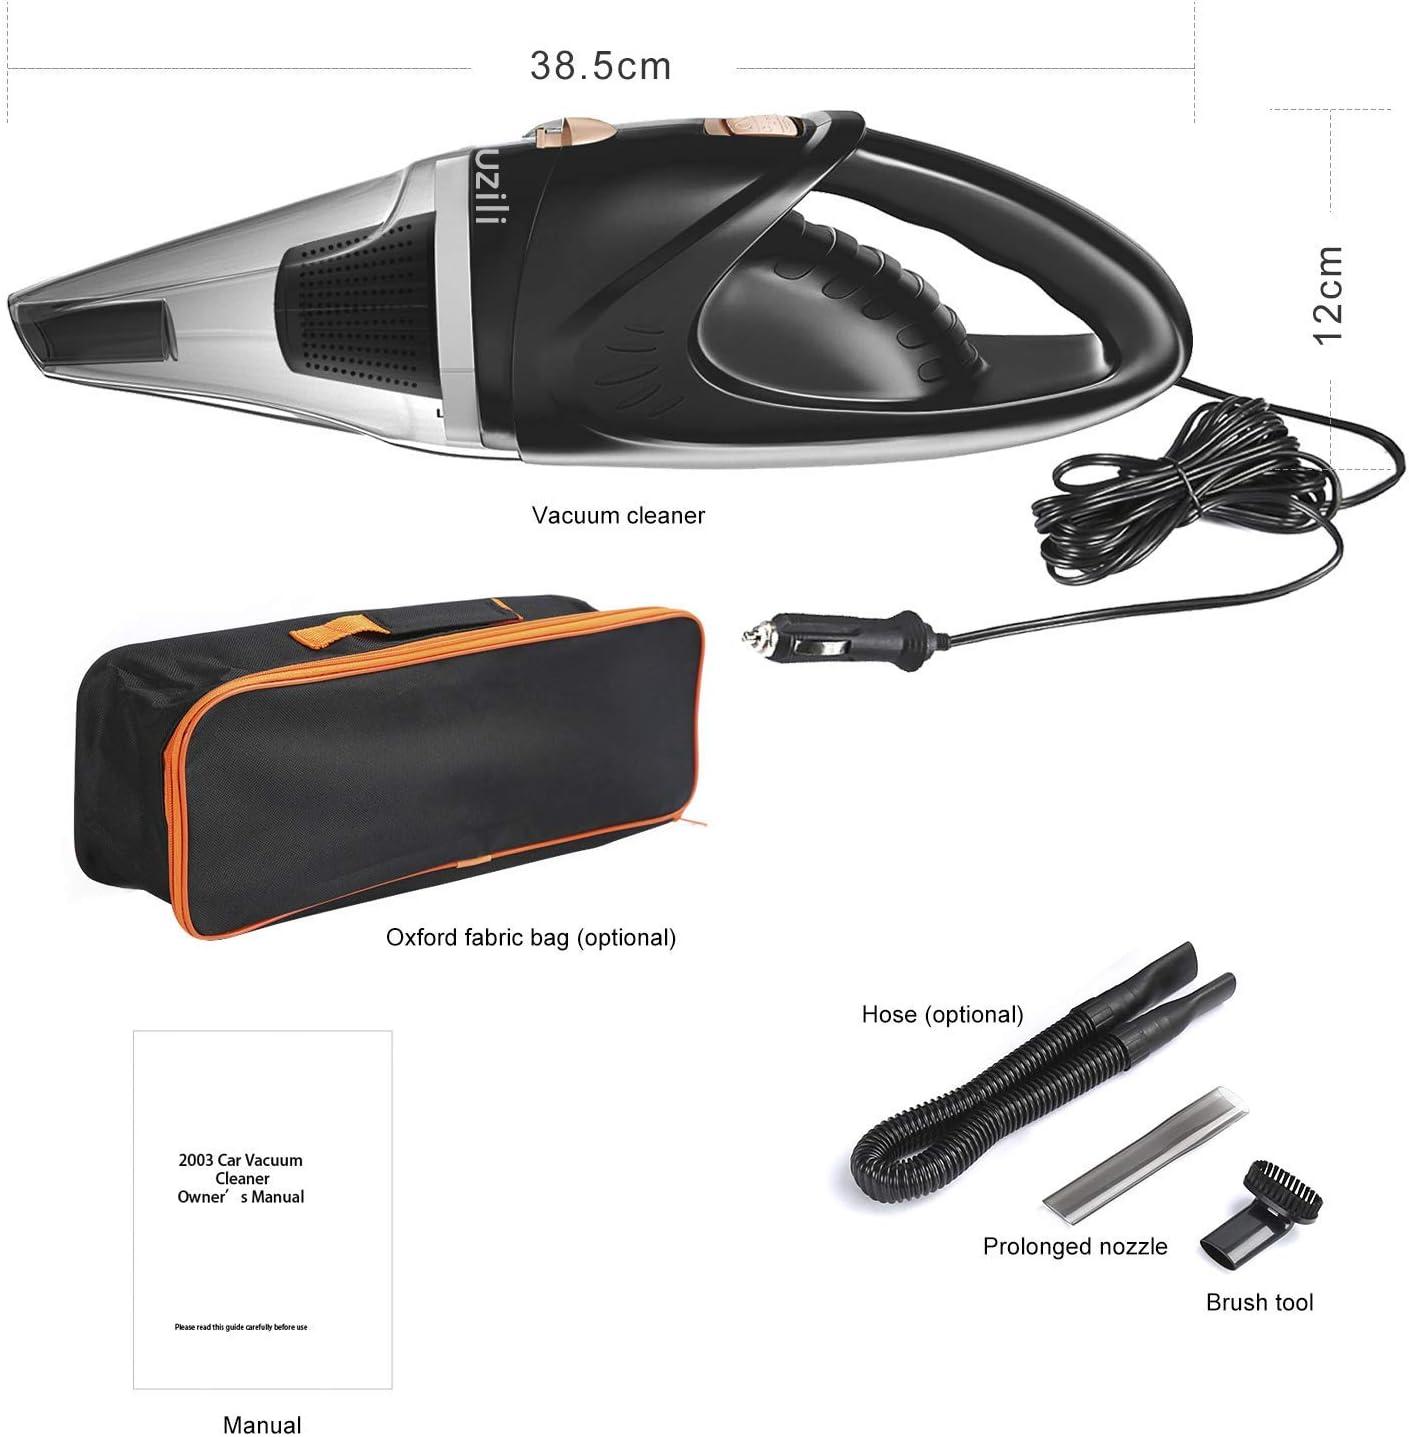 Muzili Powerful Cleaning Lightweight Handheld Corded Car Vacuum